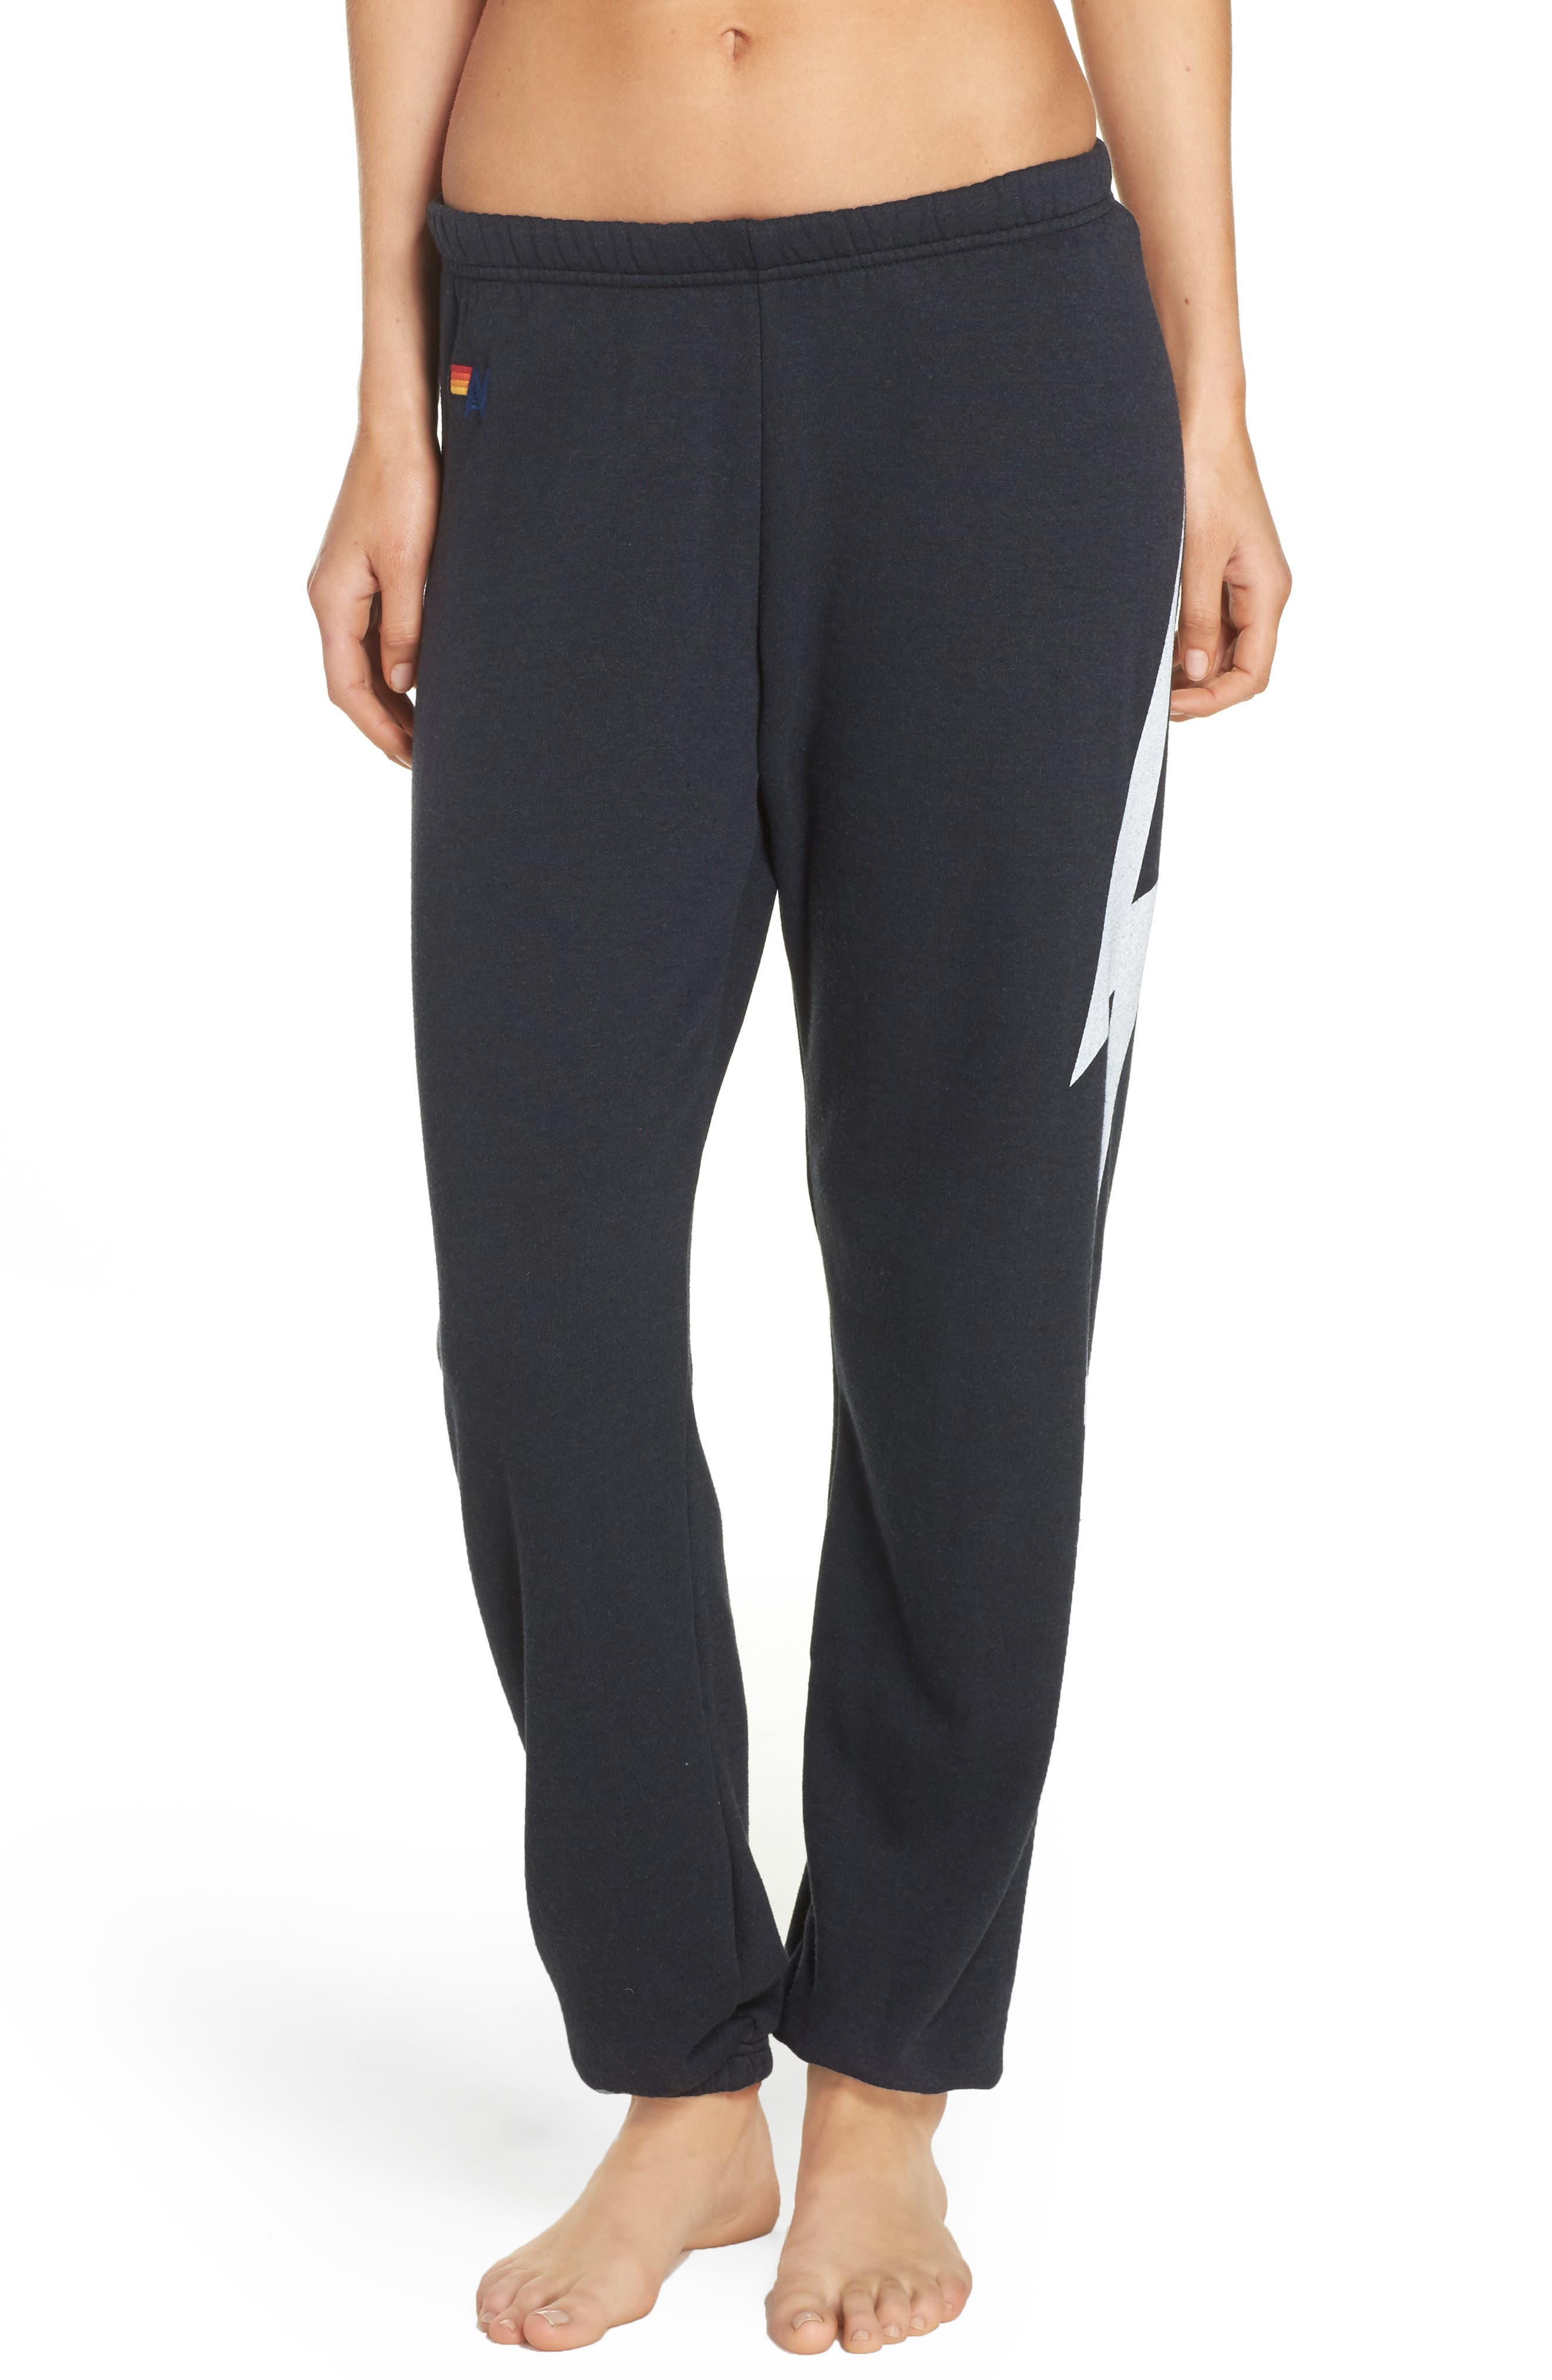 Bolt Sweatpants,                         Main,                         color, CHARCOAL